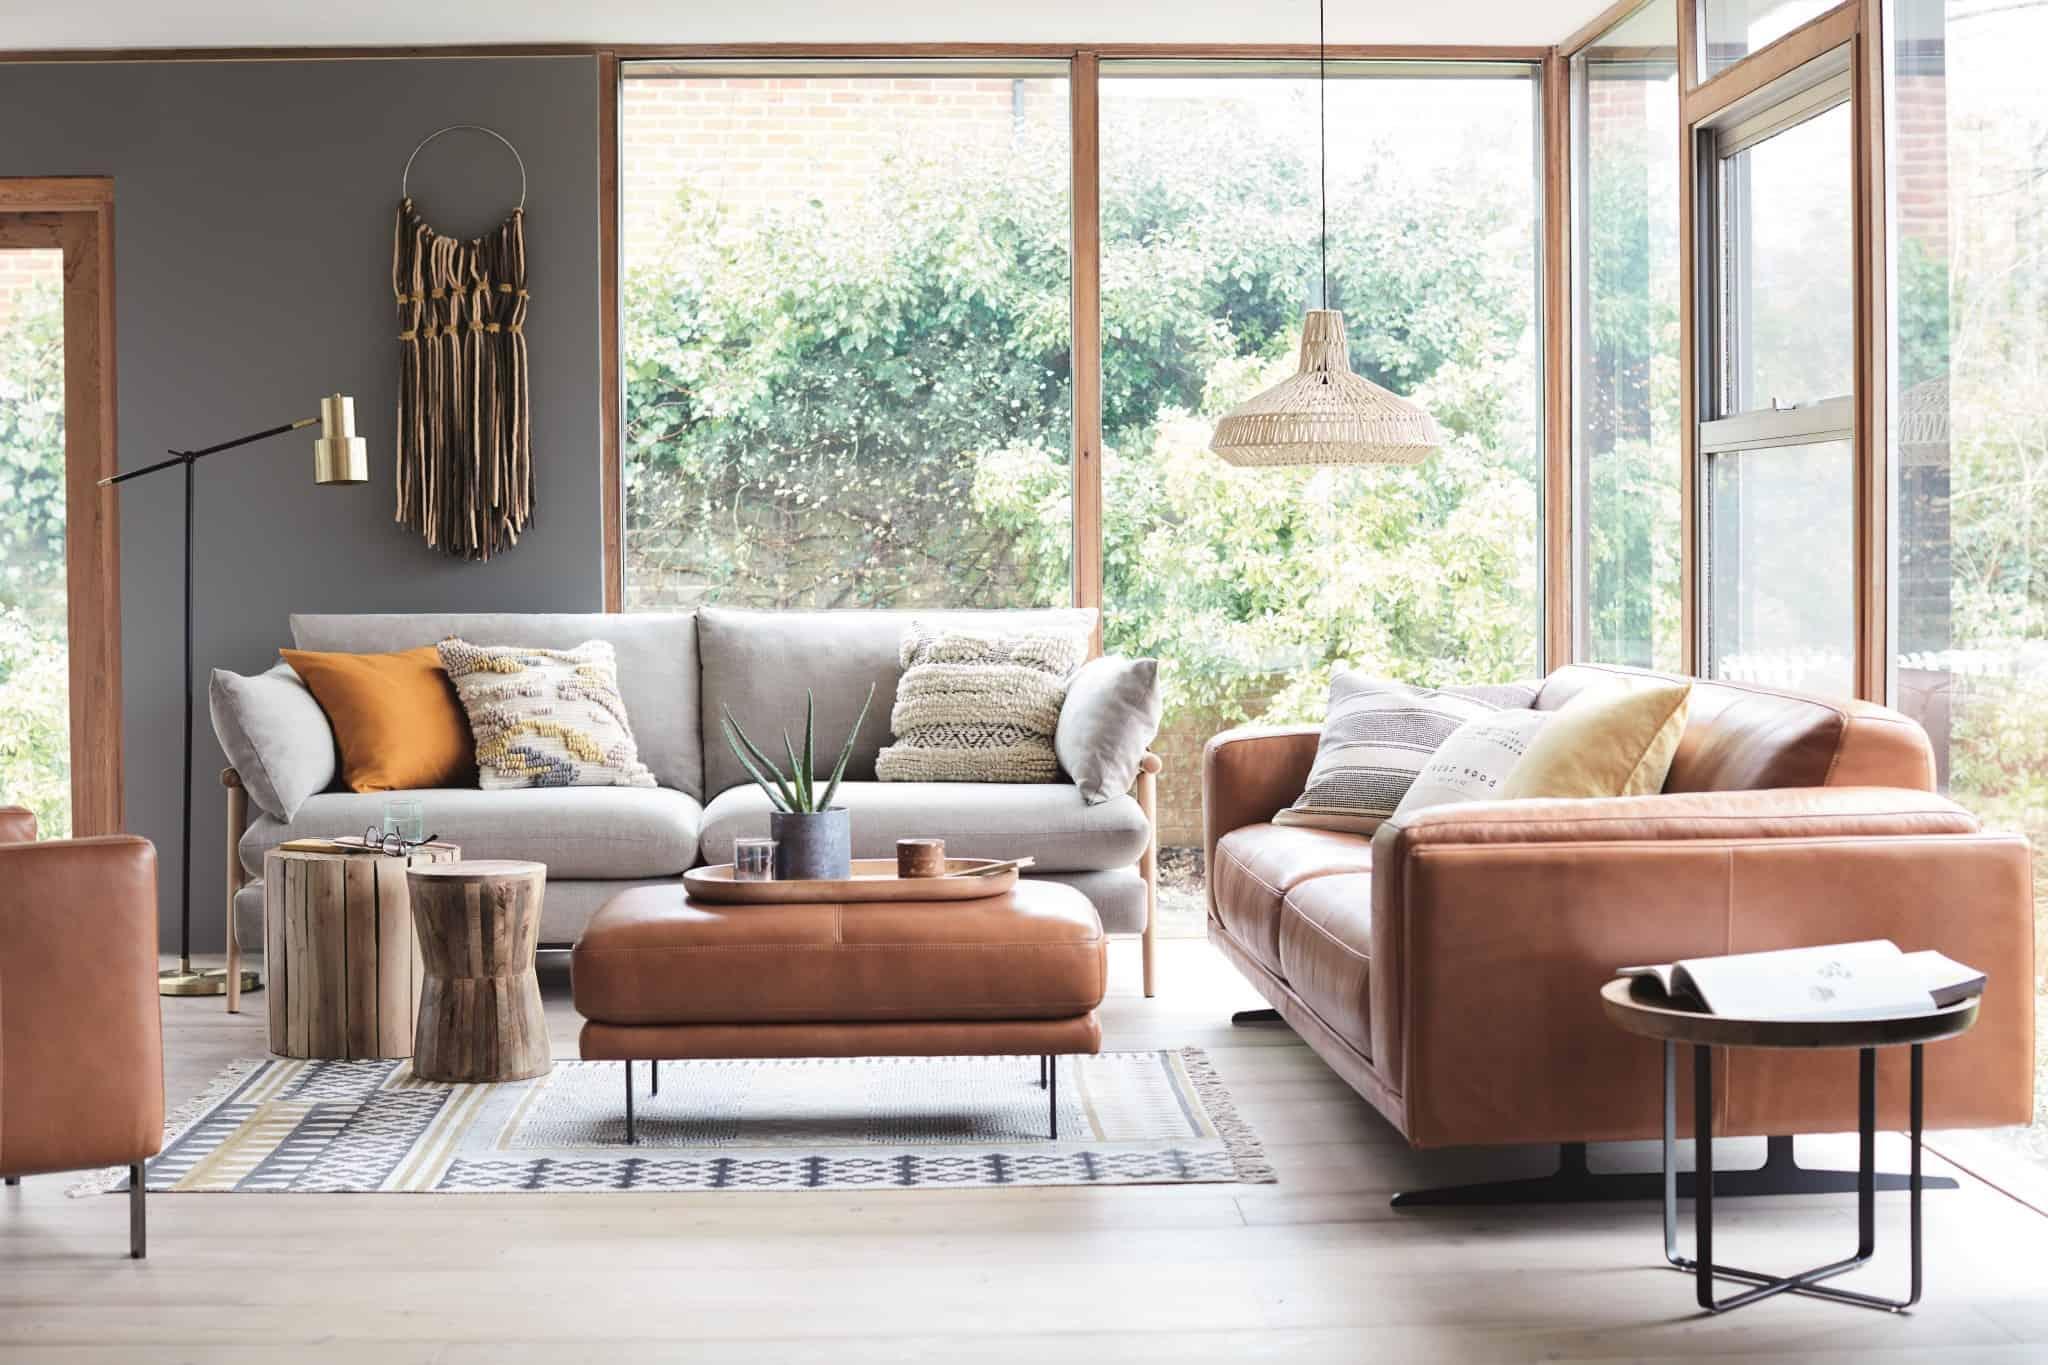 dfs french connection quartz sofa review queen size convertible sofas creativeadvertisingblog